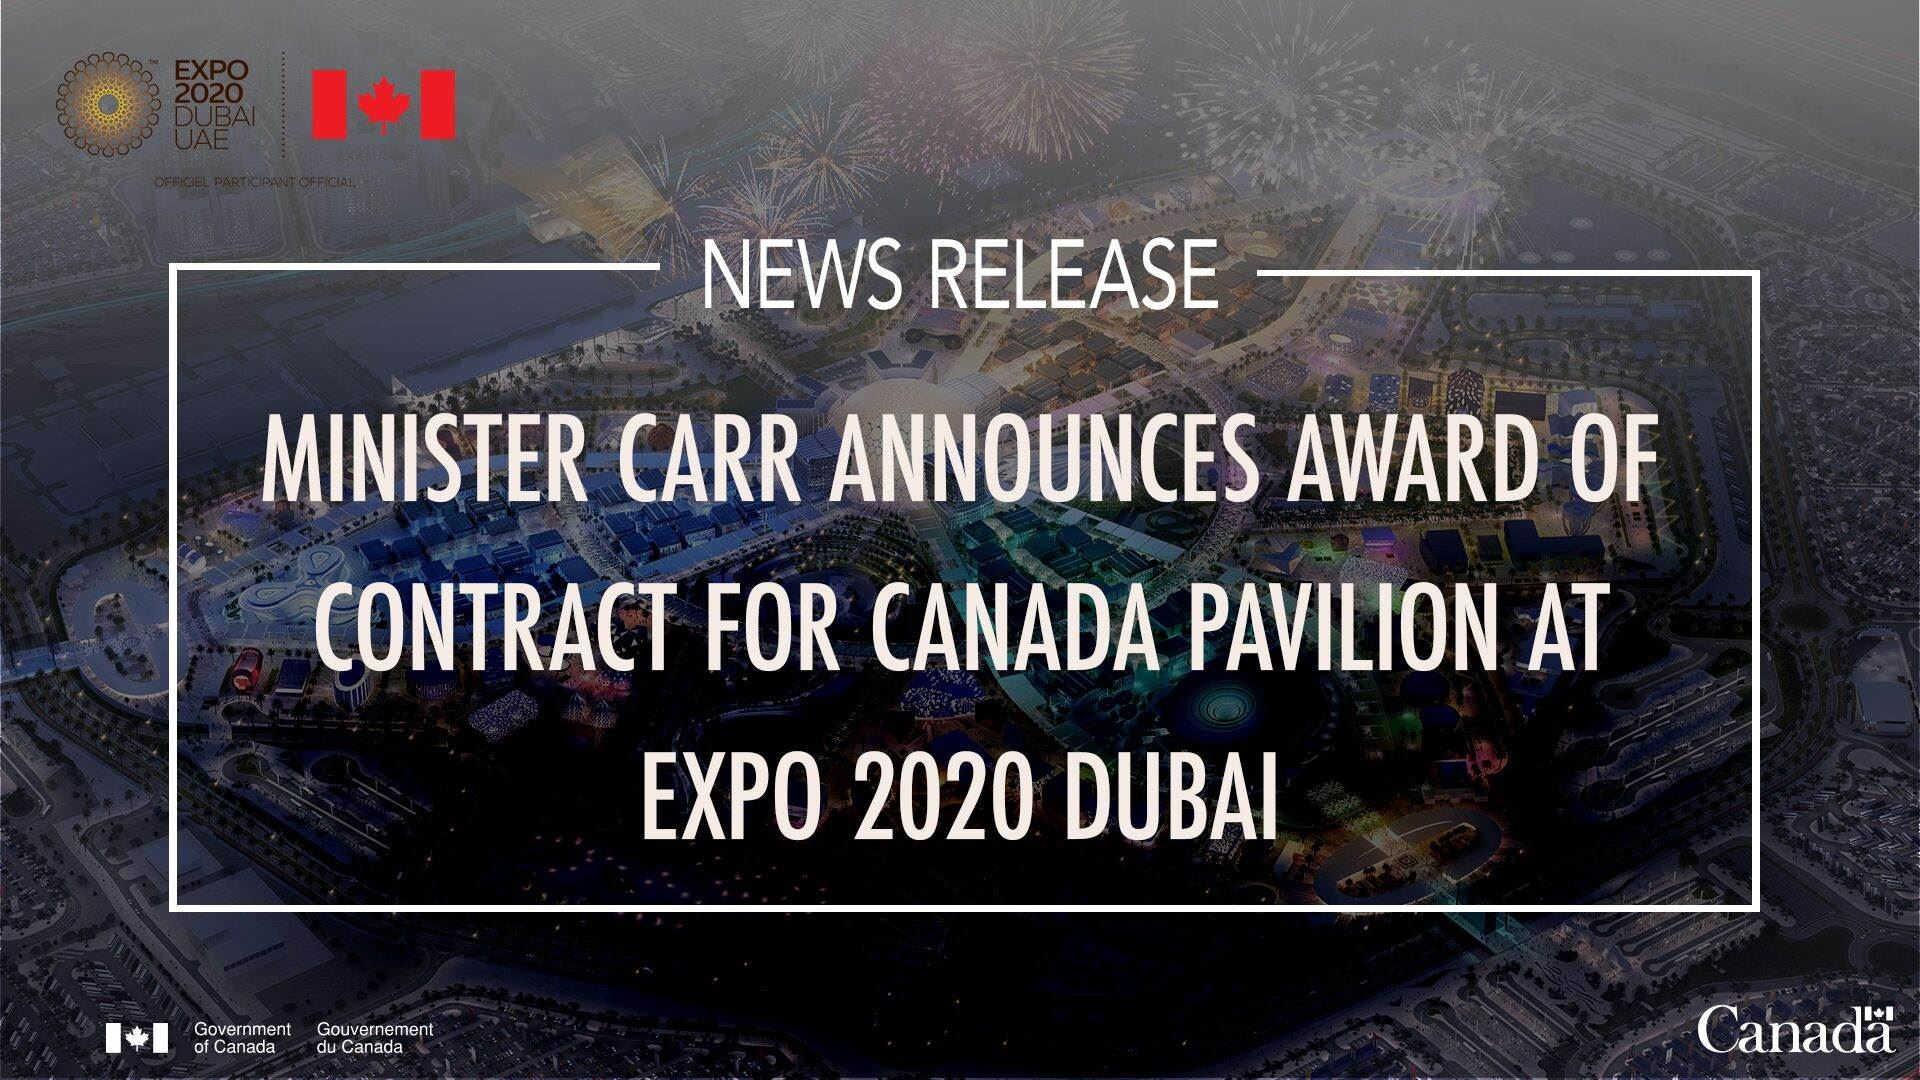 Canadian Business Council Abu Dhabi - Canada - UAE News